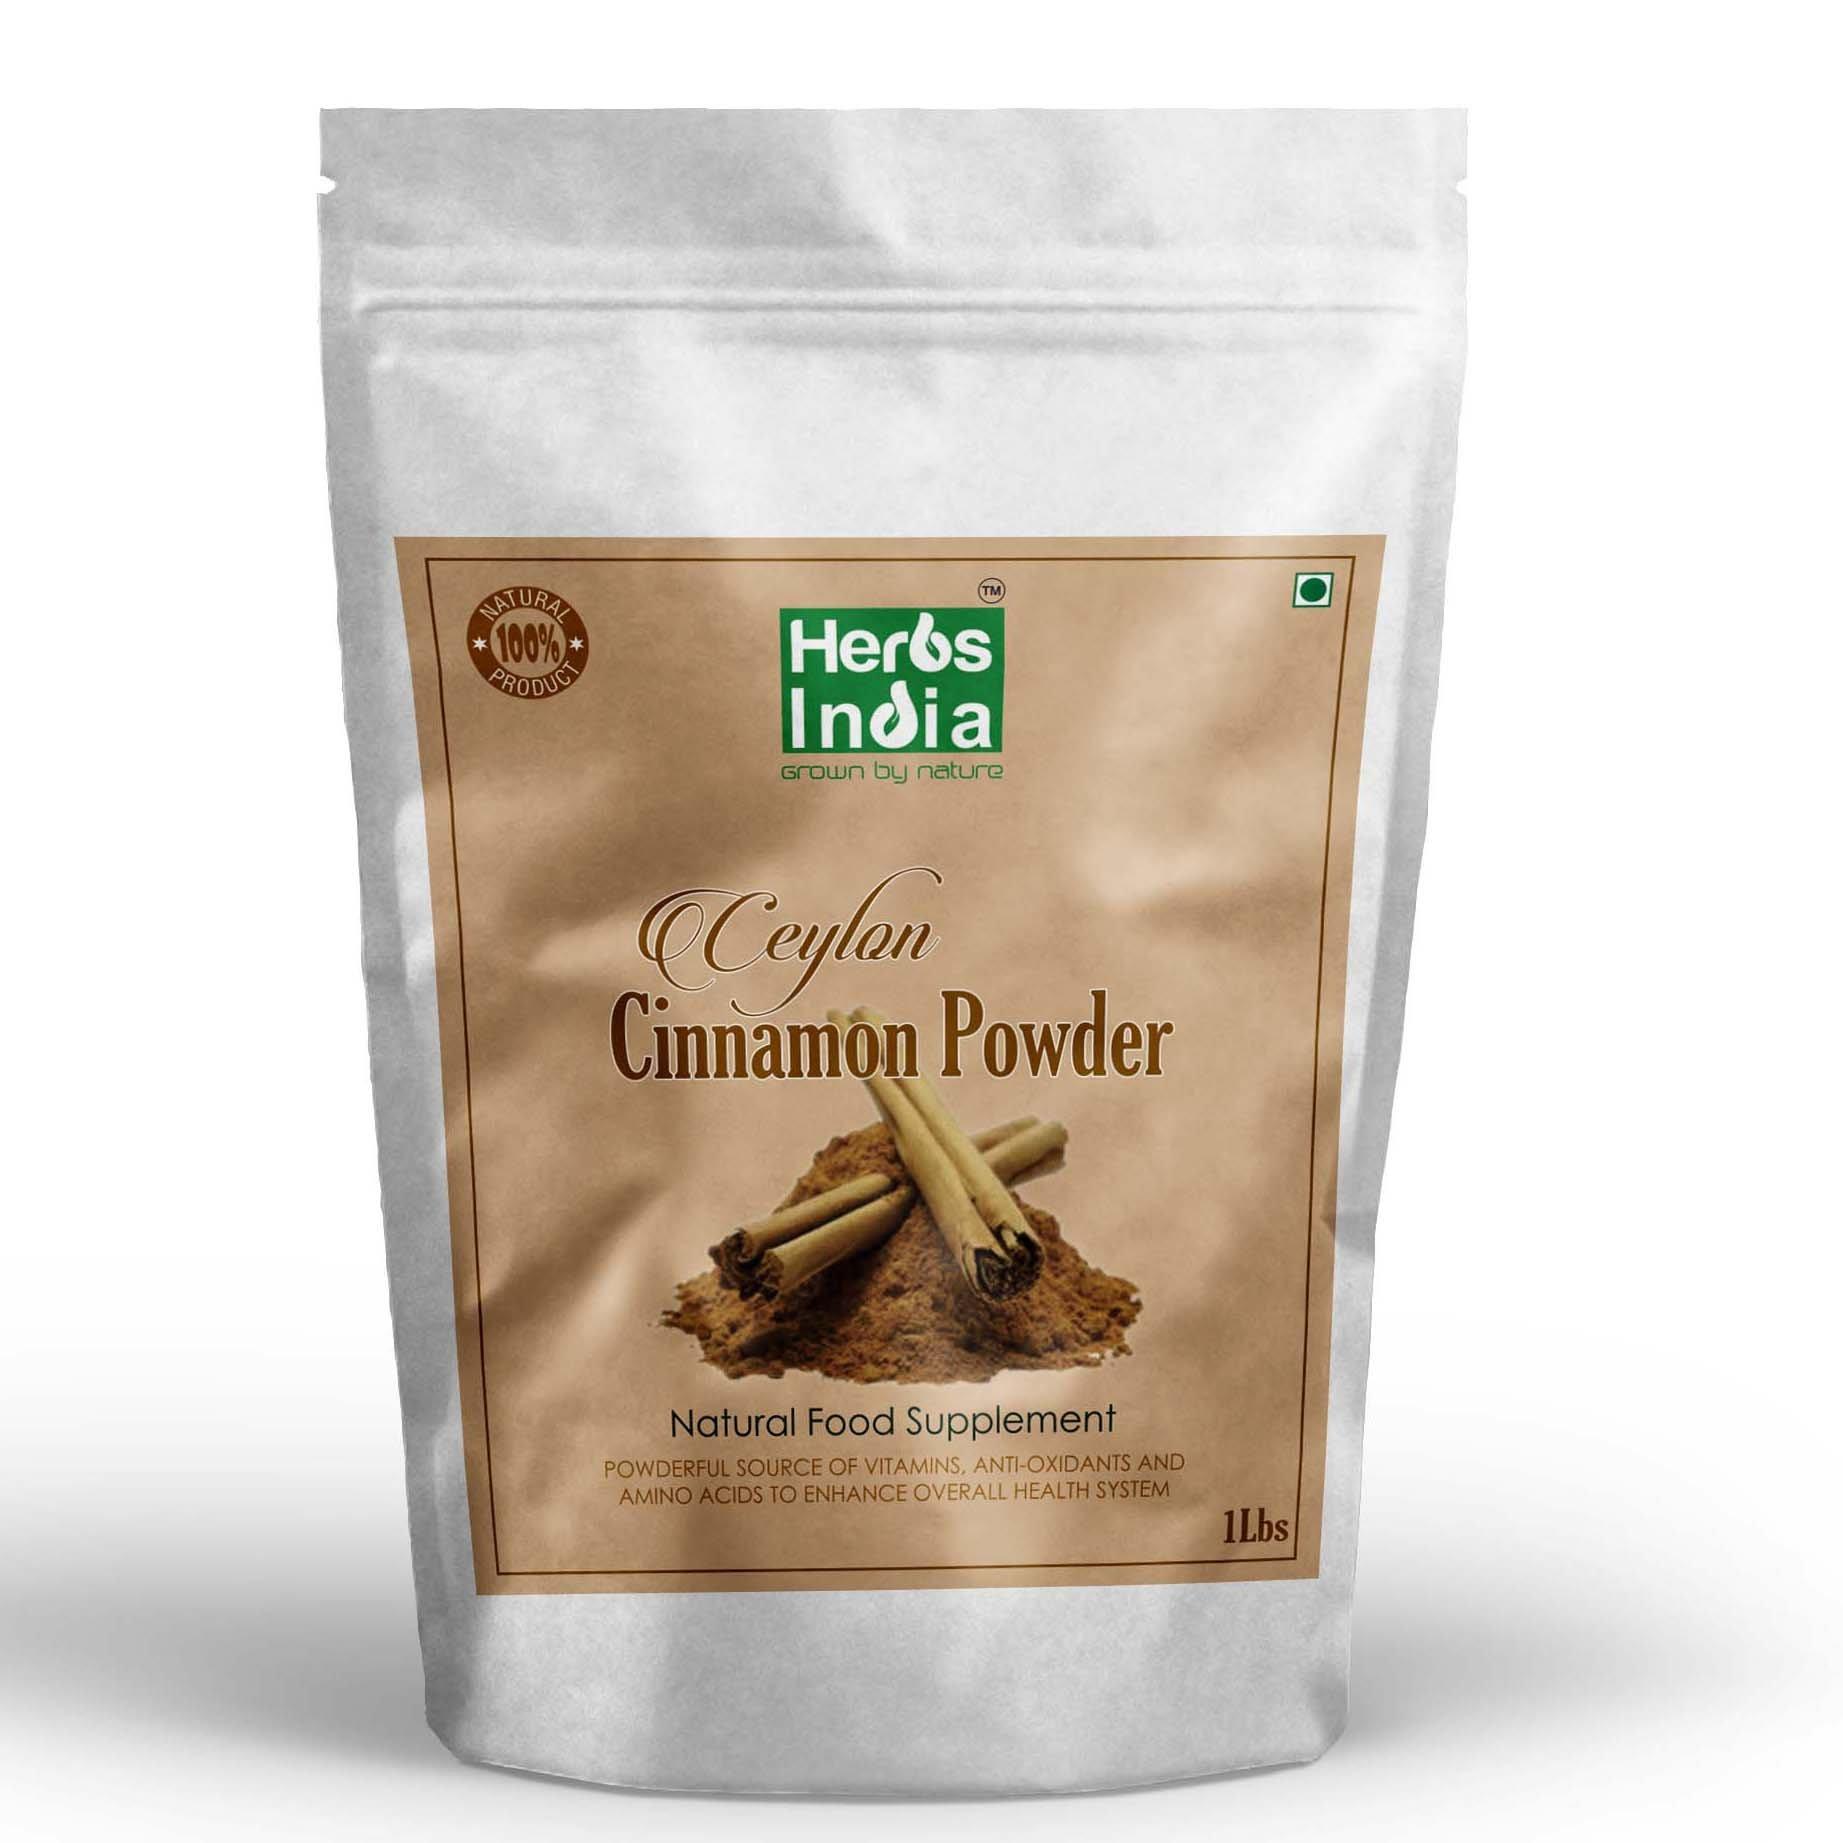 Herbs India - Cinnamon (Ceylon) Powder 16 Oz 1Lb. 100% Premium Ceylon Cinnamon 18